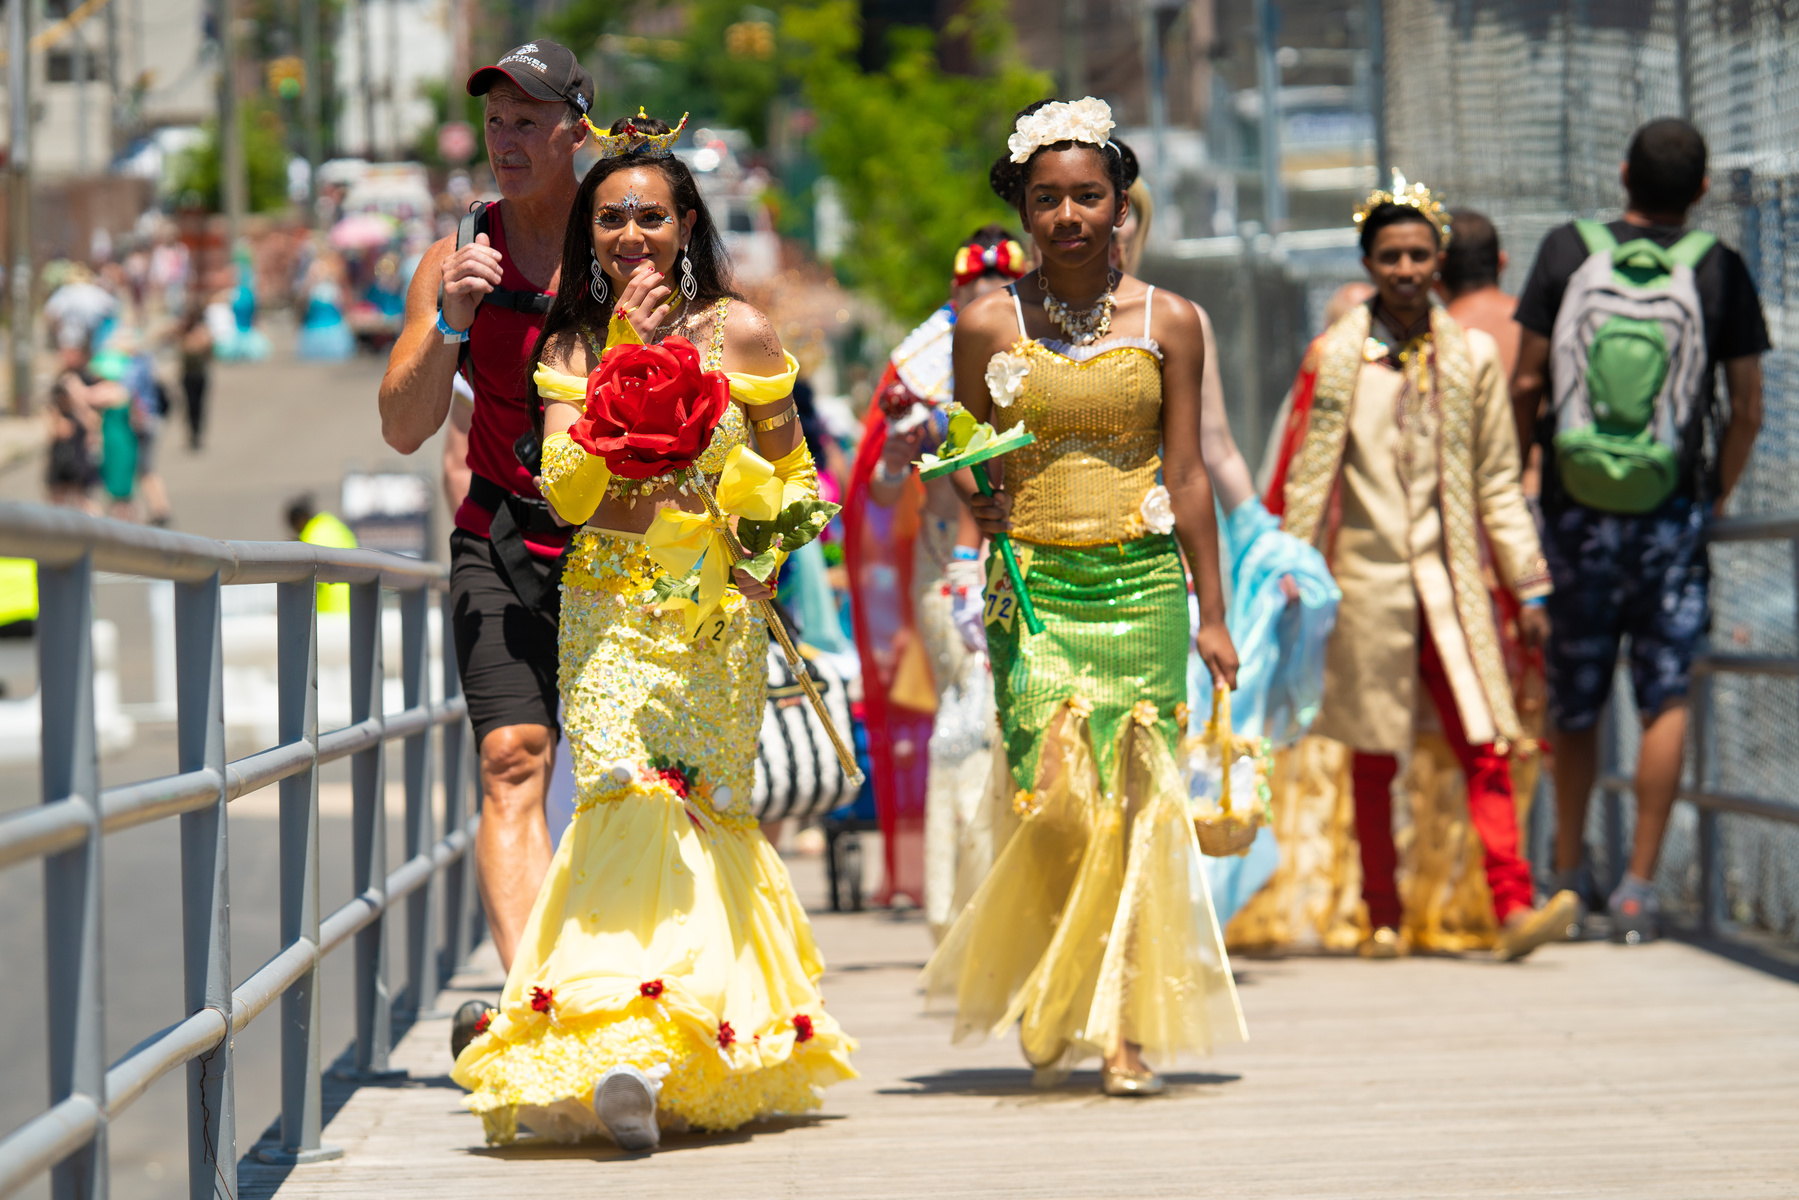 Coney Island Mermaid Parade 2018 (35).jpeg